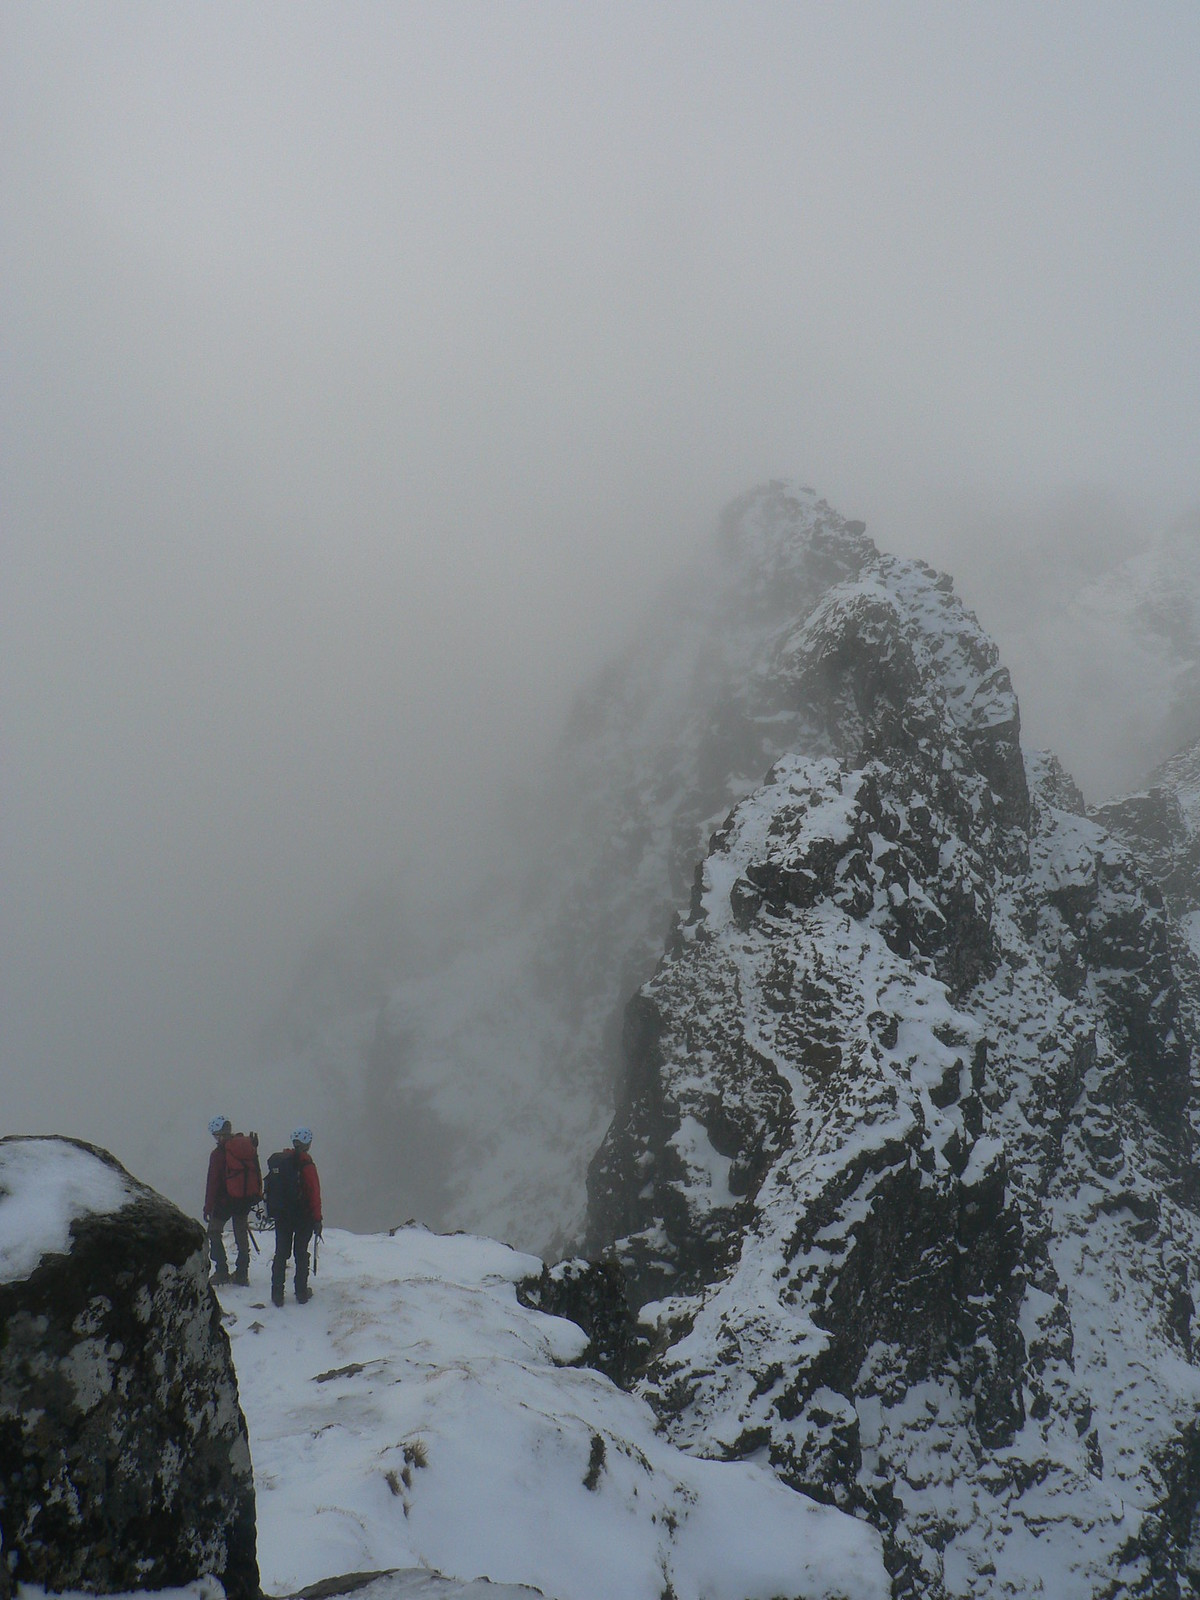 The ridge looking rather ominous ahead